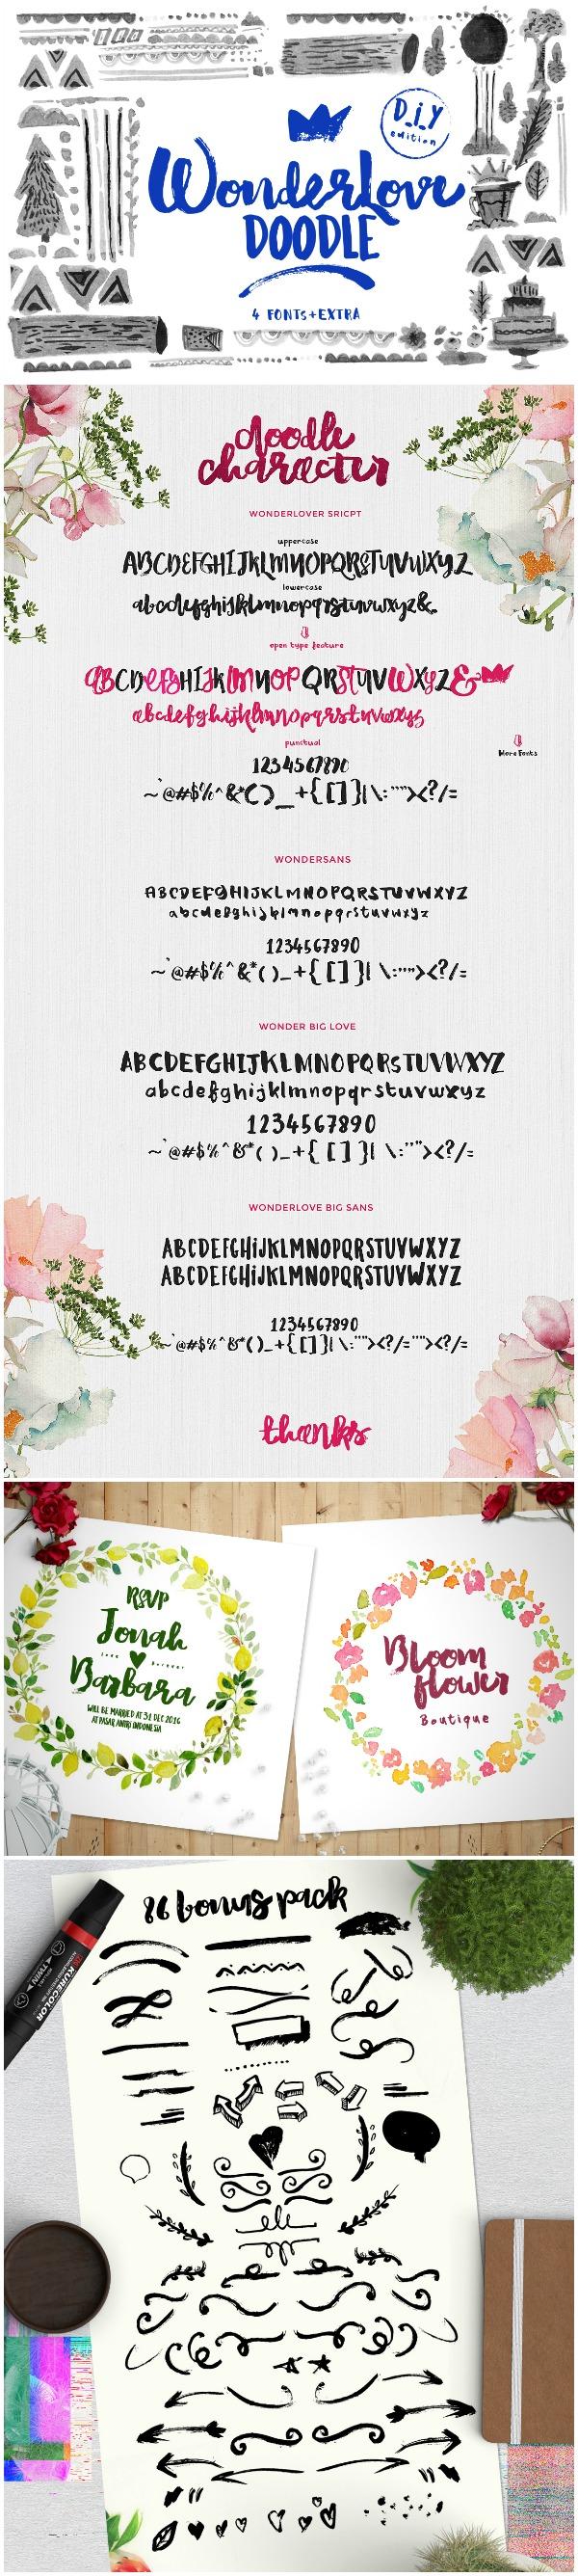 Favorite Fonts: Wonderlove Font. This bold brush font makes casual look elegant!